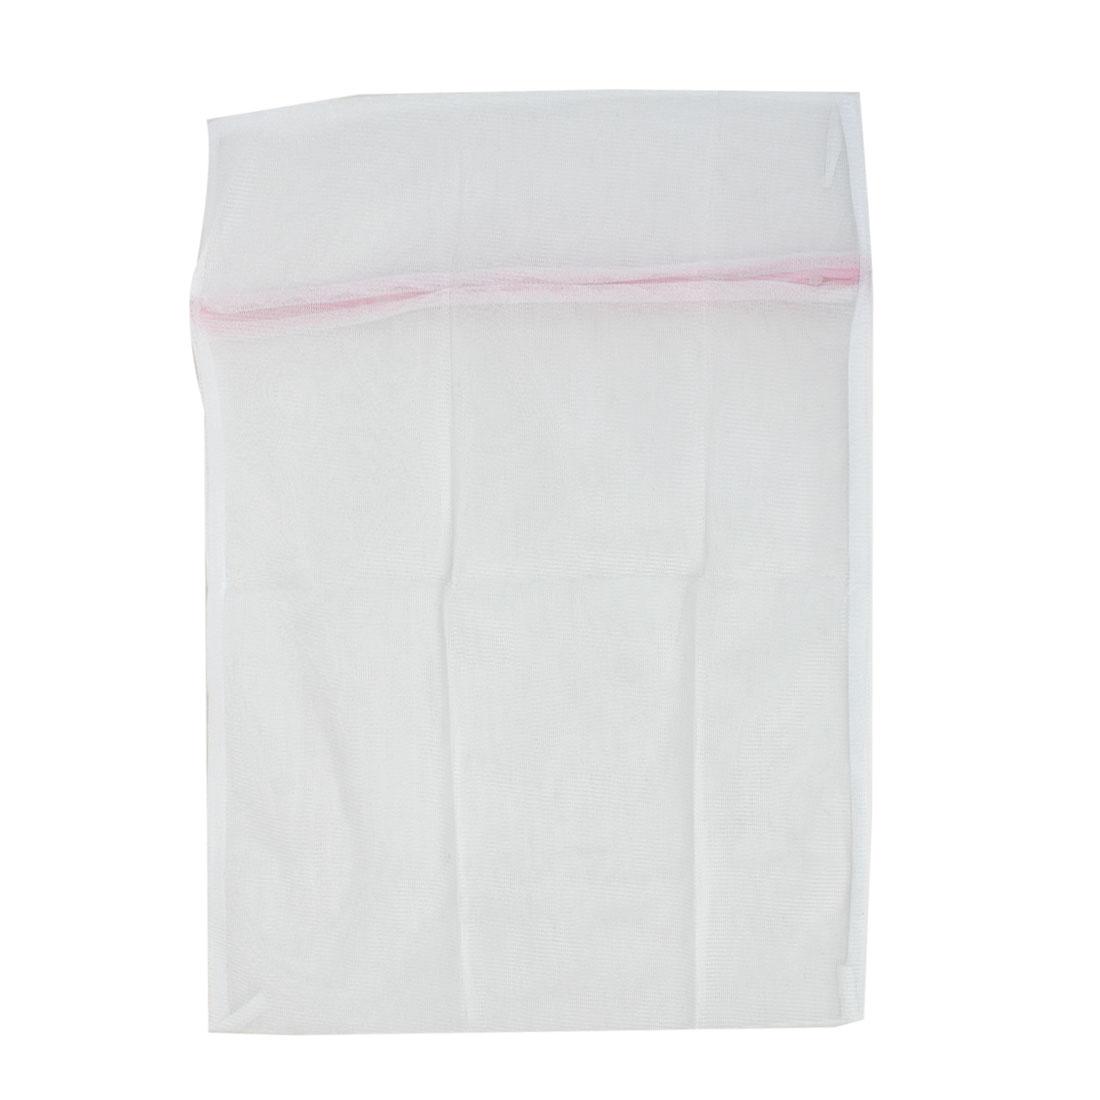 Zip Up White Nylon Mesh Wash Medium Cloths Bras Underwear Laundry Net Washing Bag 40 x 50cm